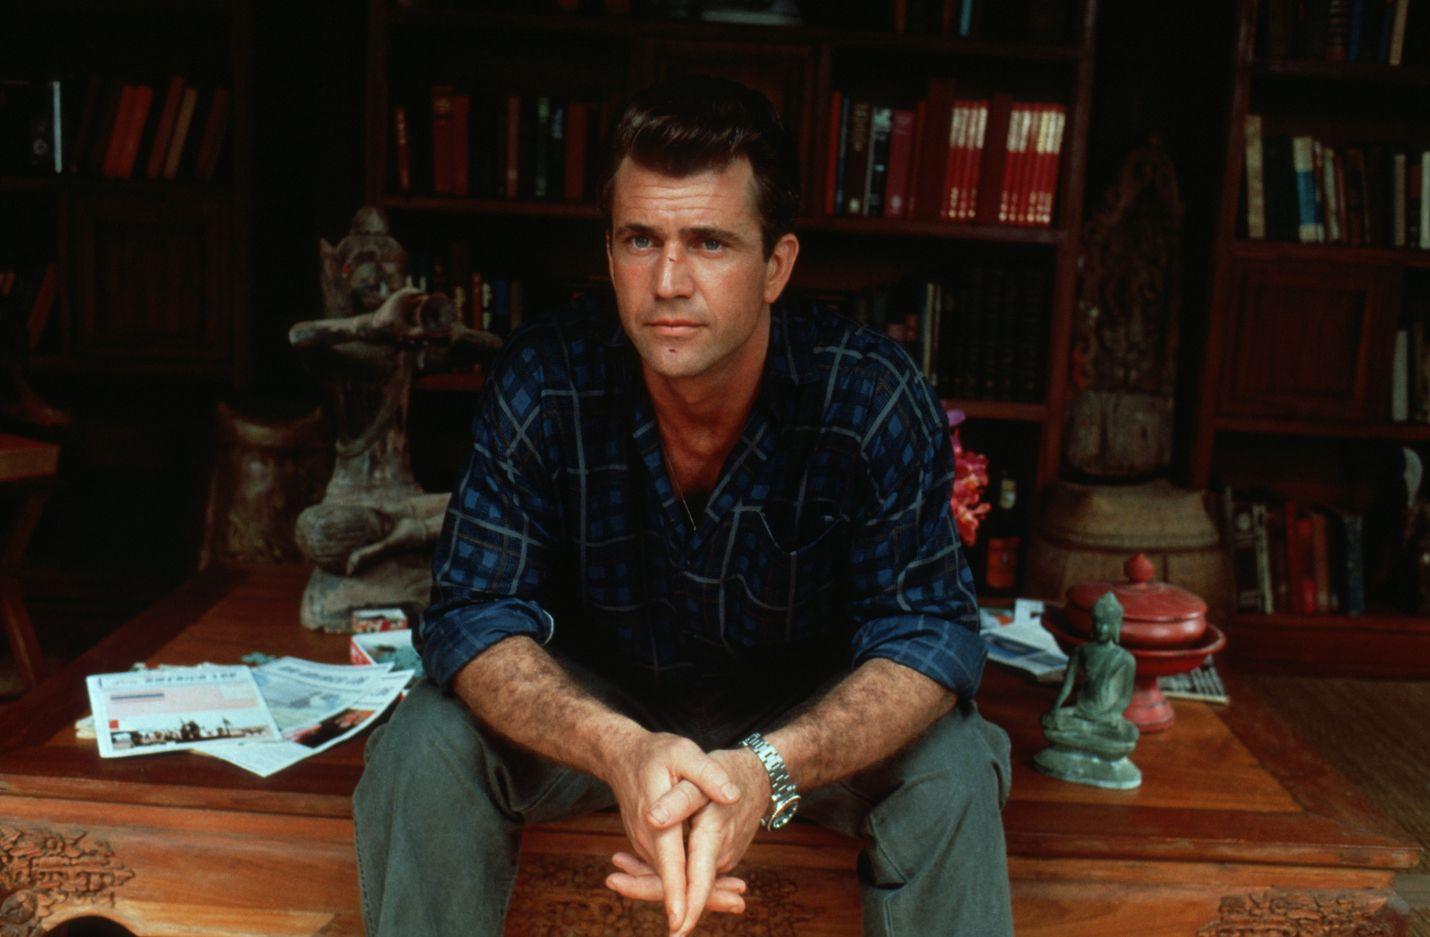 Mel Gibson on kokeneempi kollega Air America -toimintakomediassa.